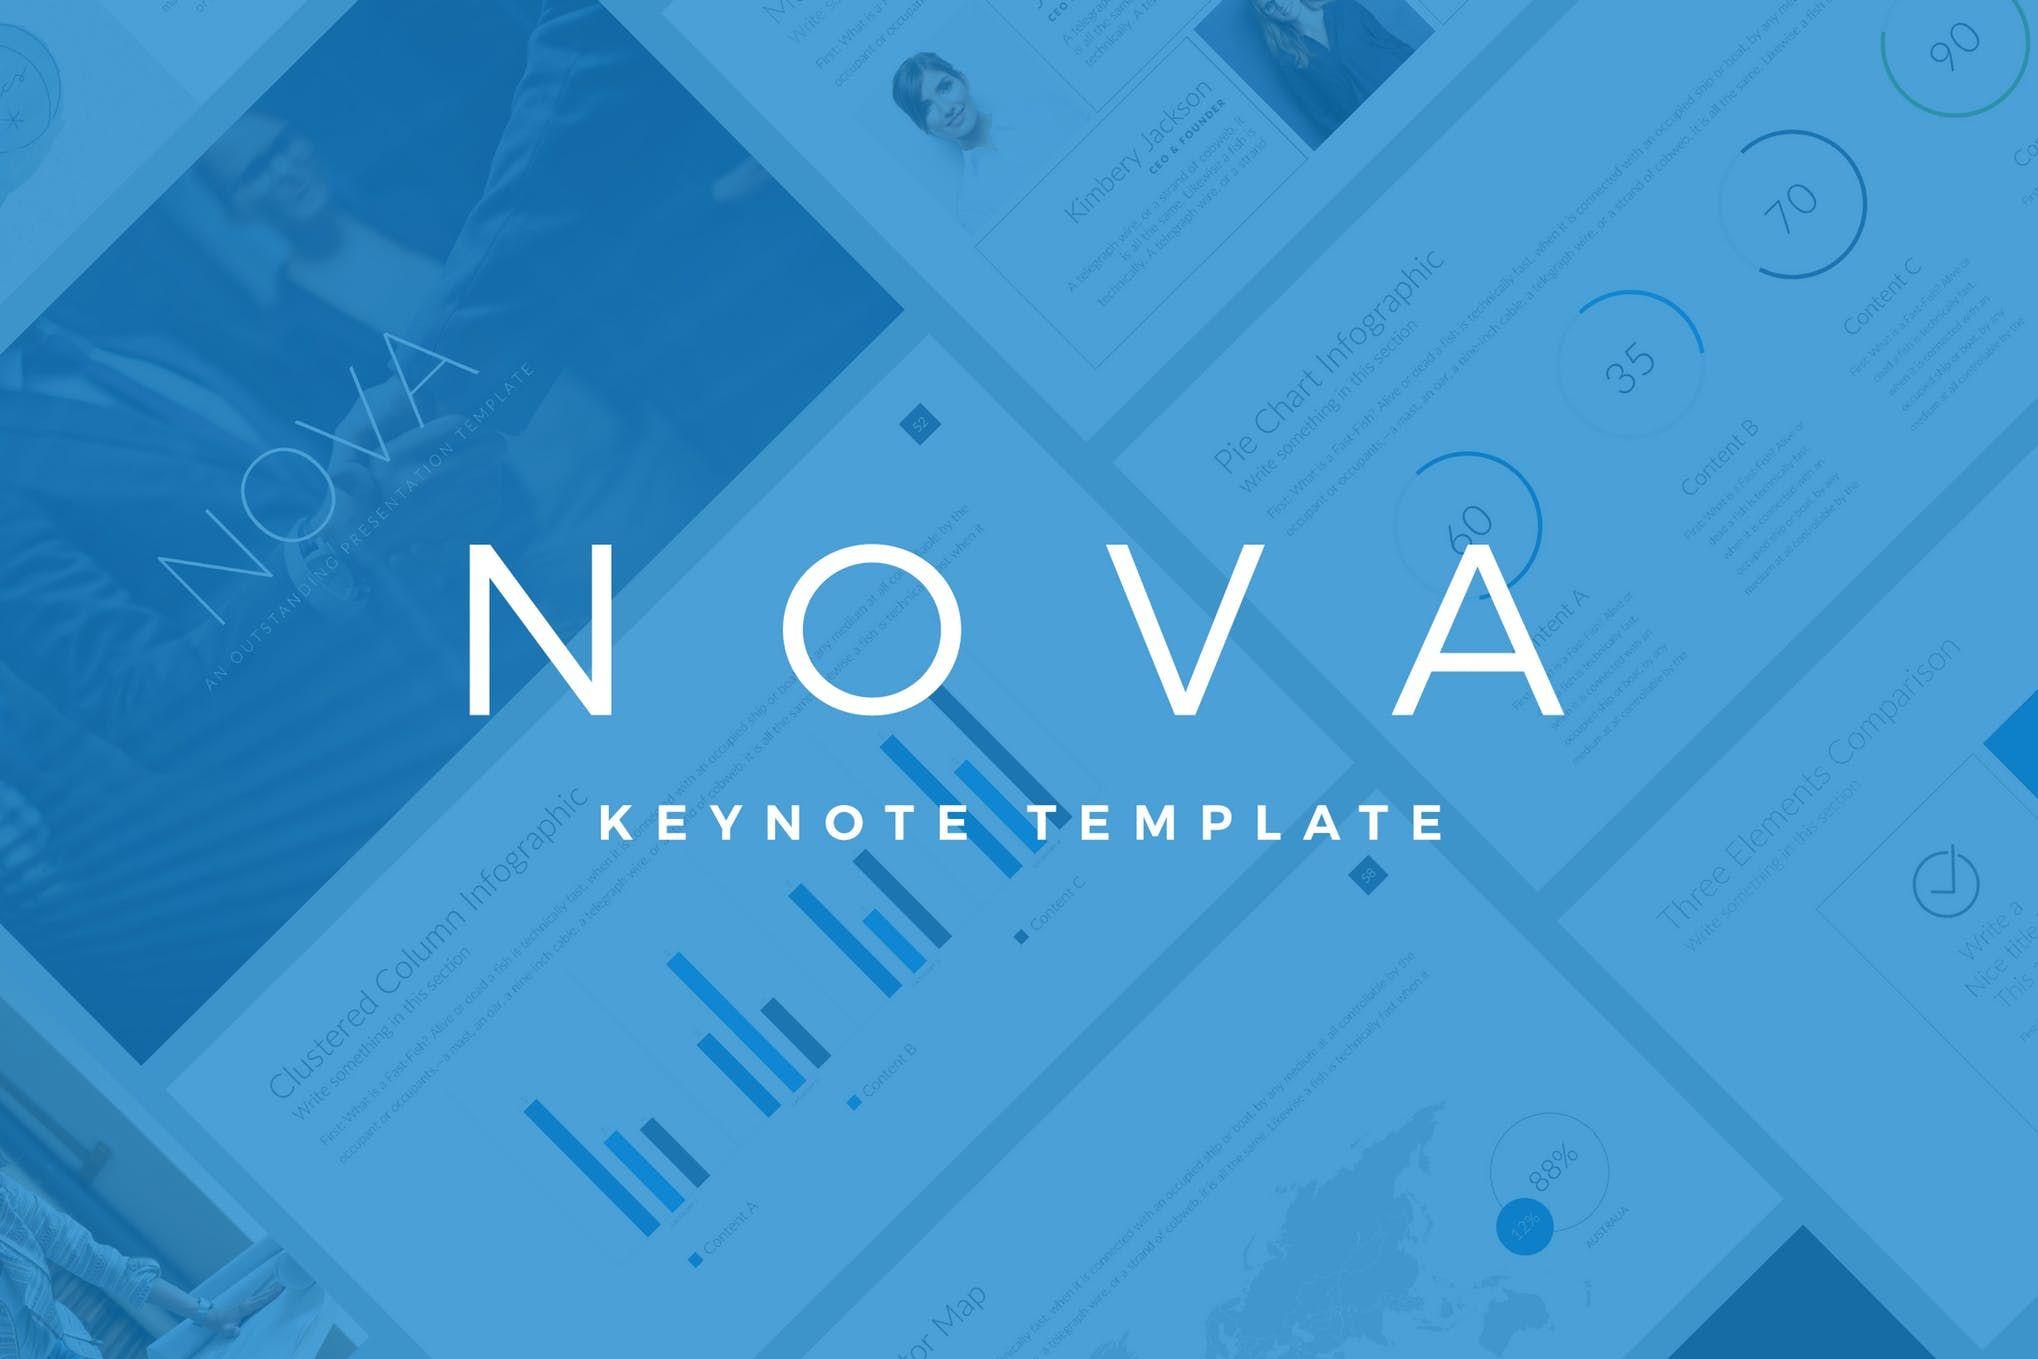 Nova Business Keynote Template Pitch Deck design